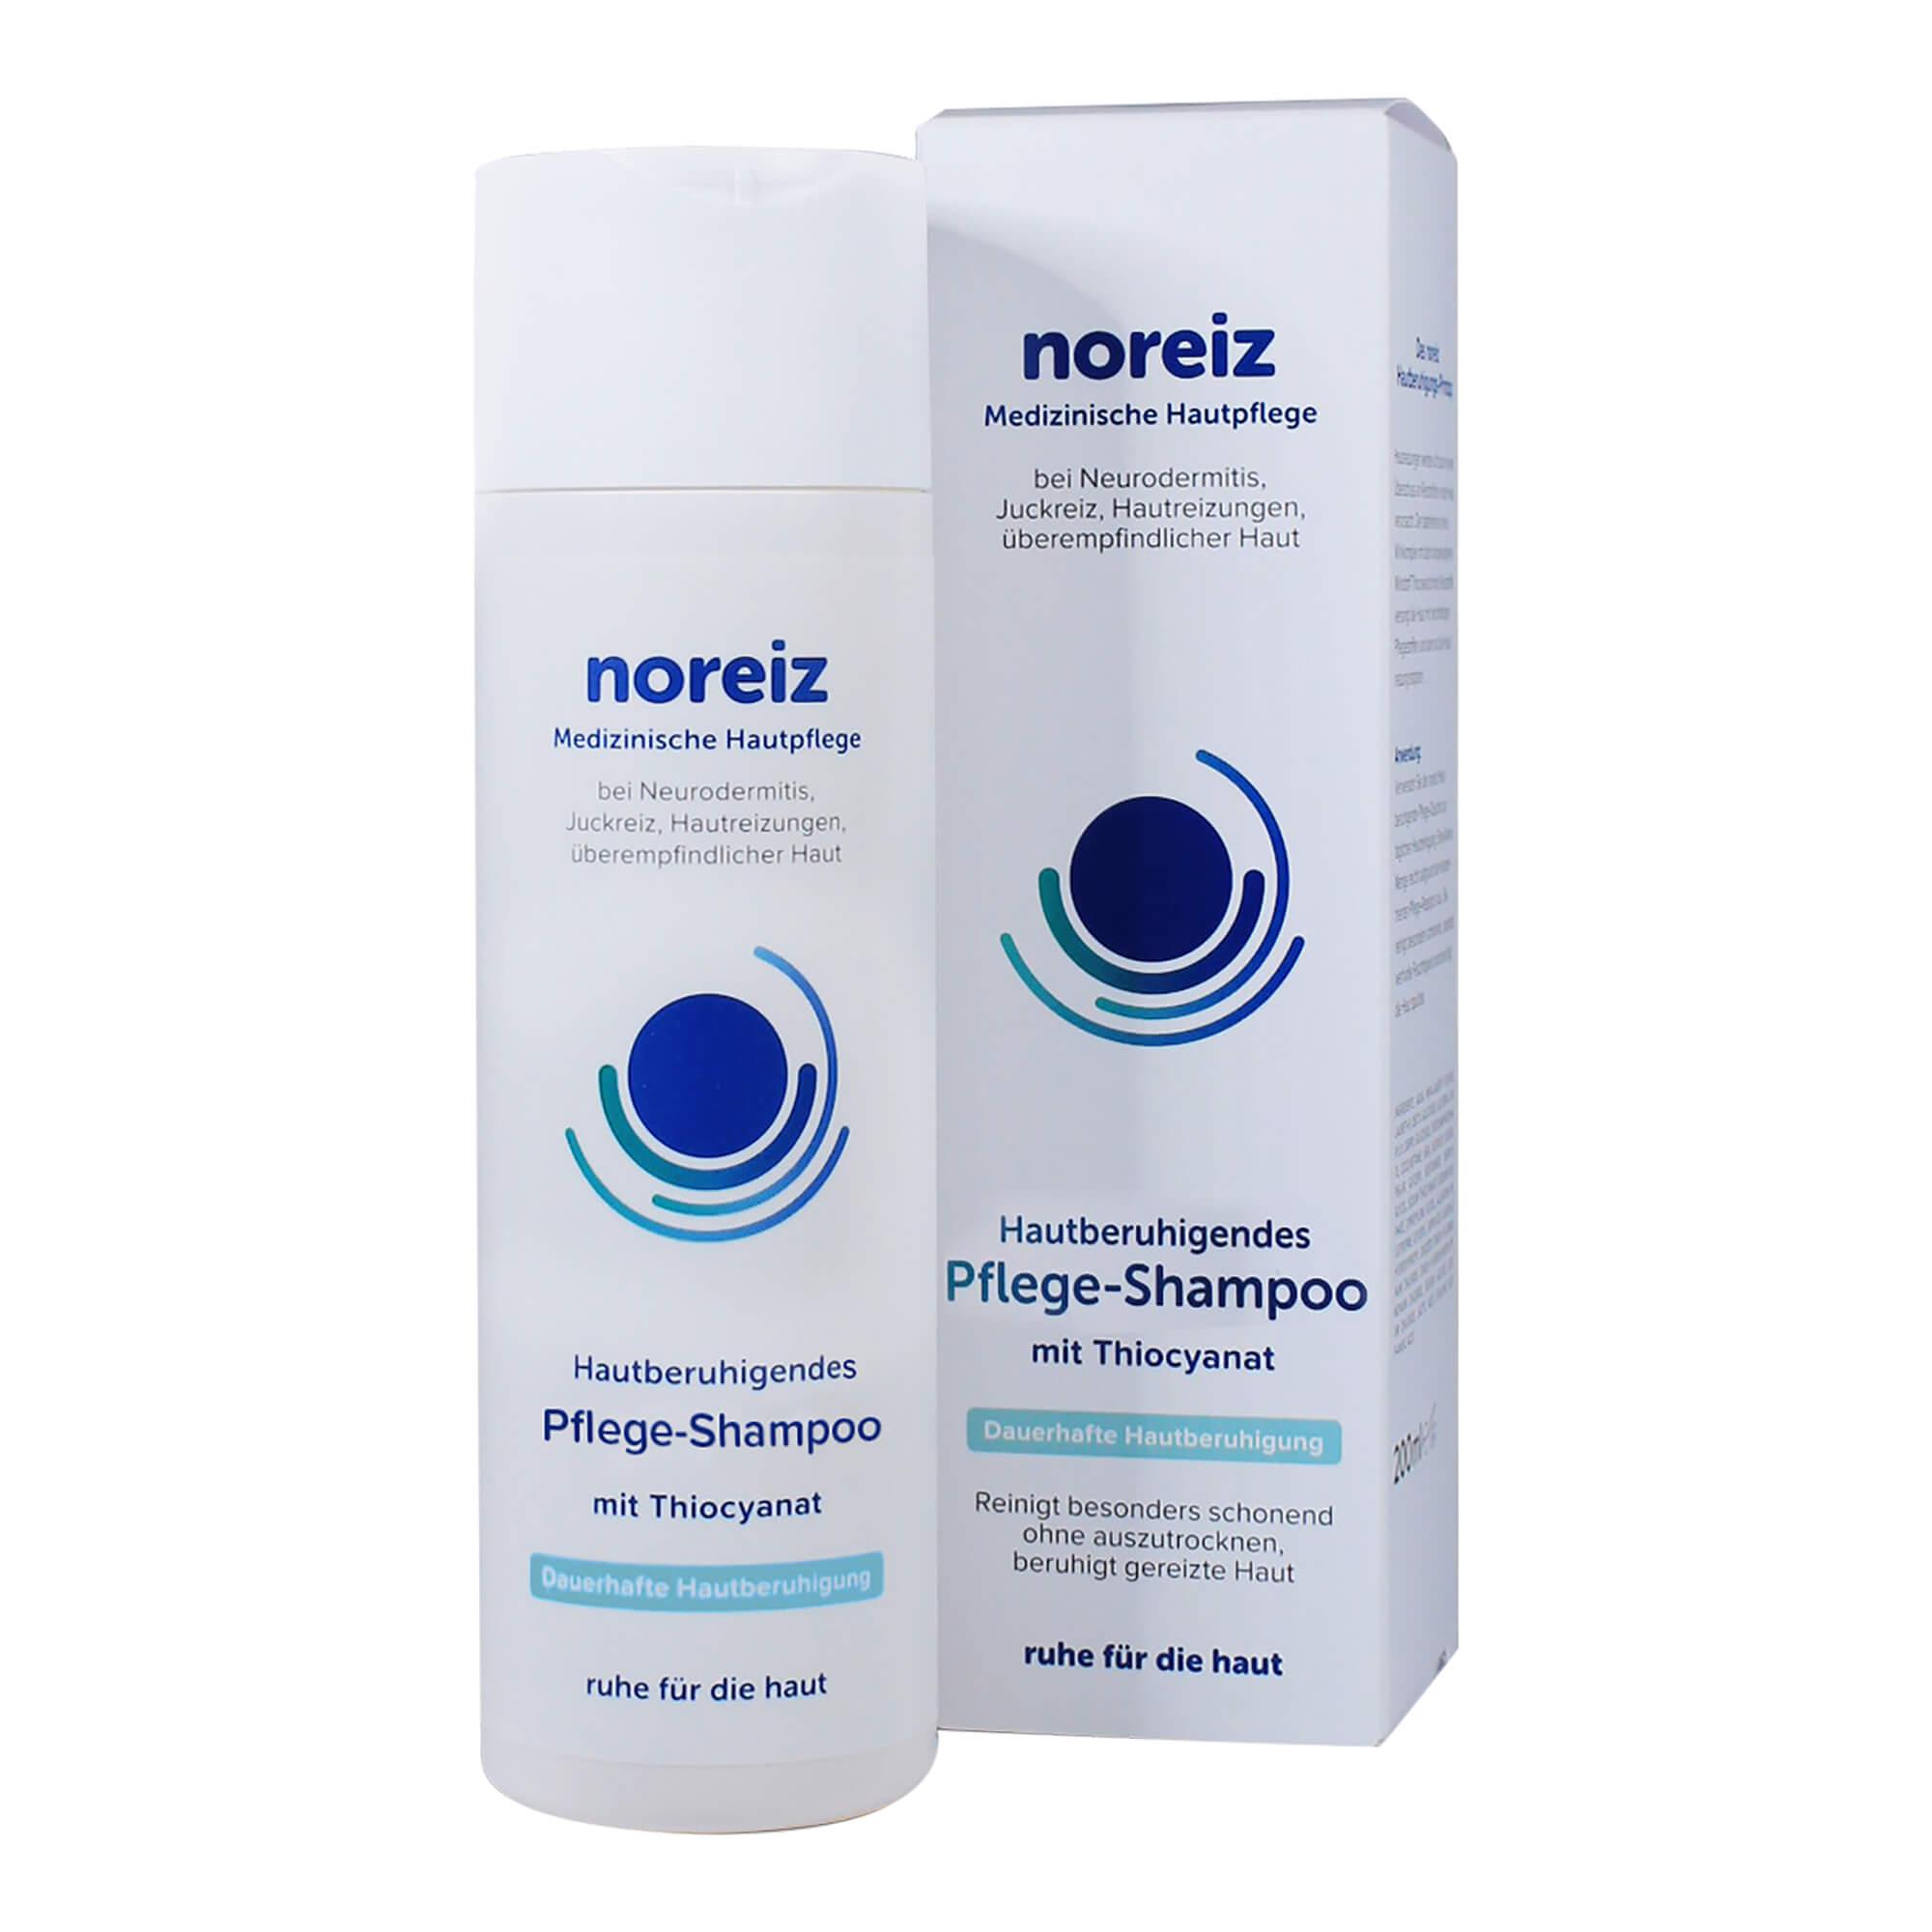 Noreiz Hautberuhigendes Pflege-Shampoo